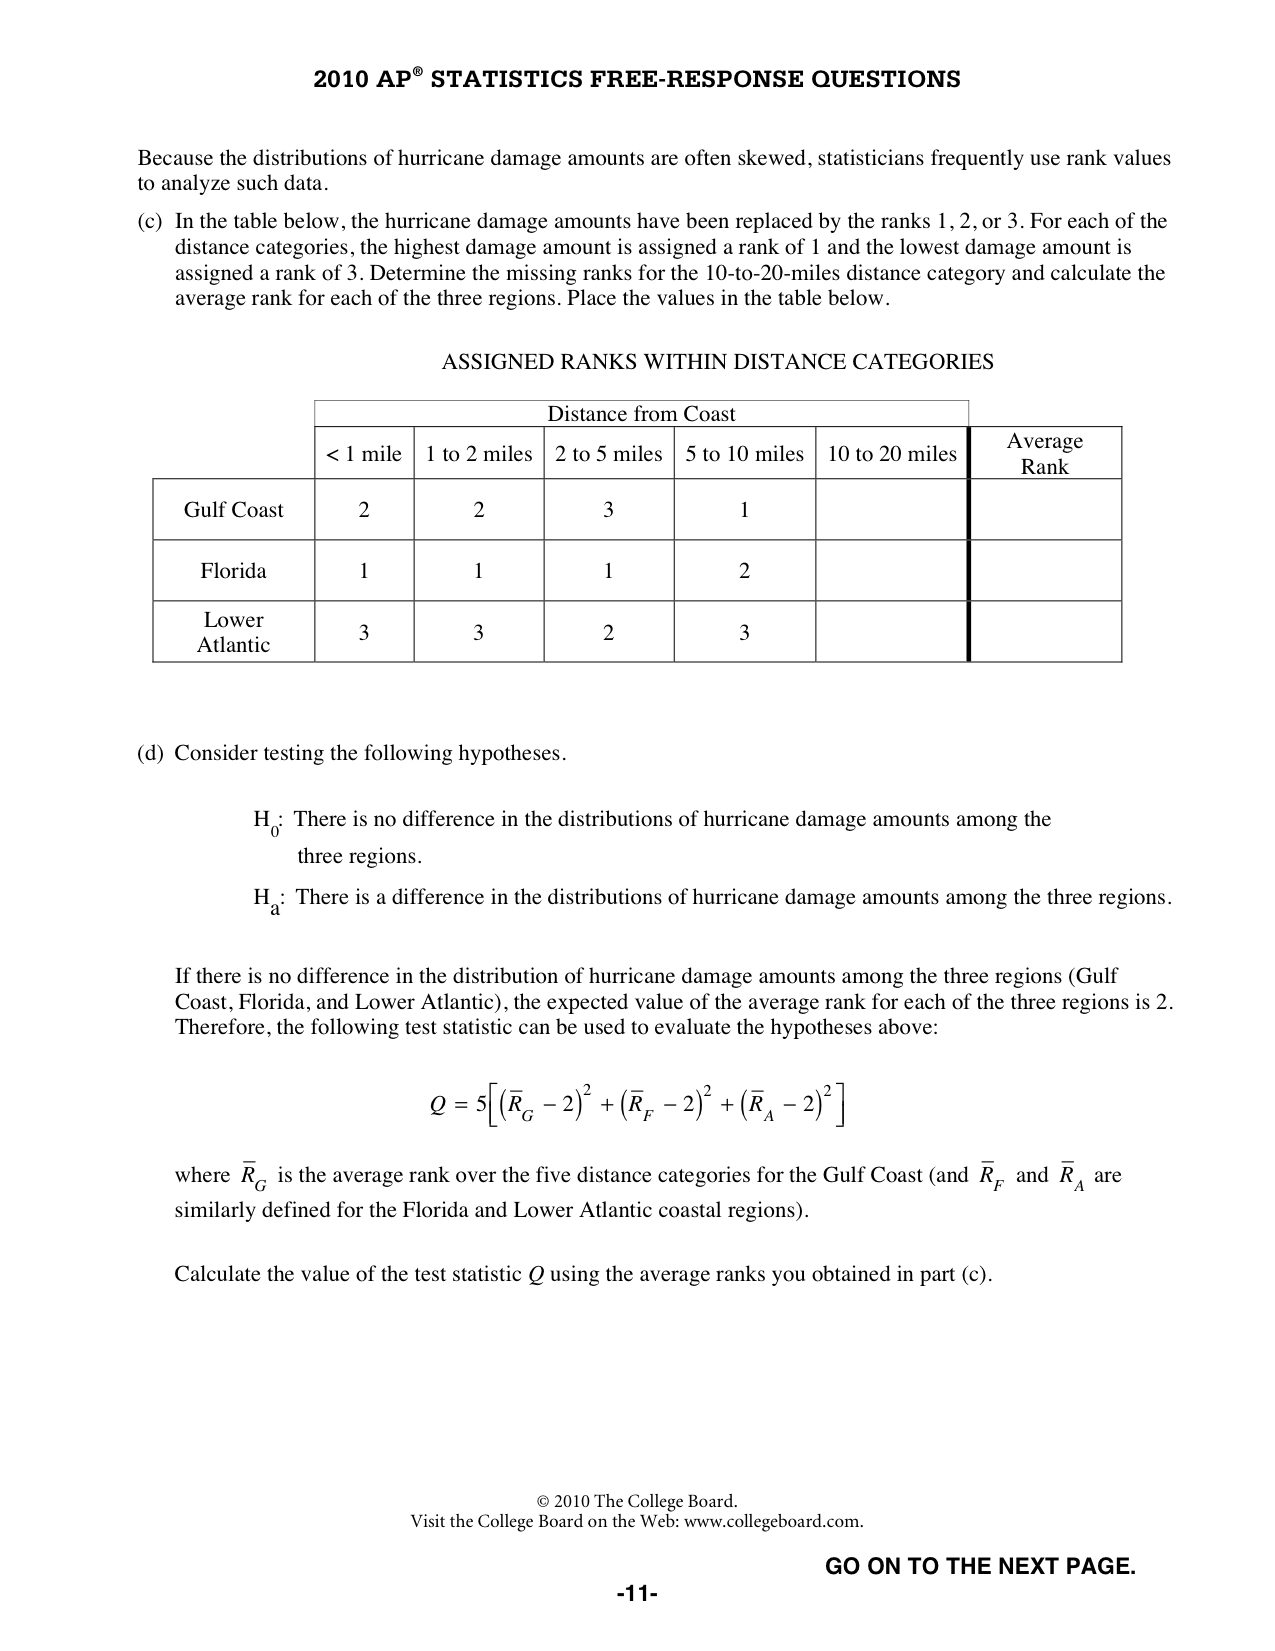 Quia - Survey for Interest Level in AP Statistics course